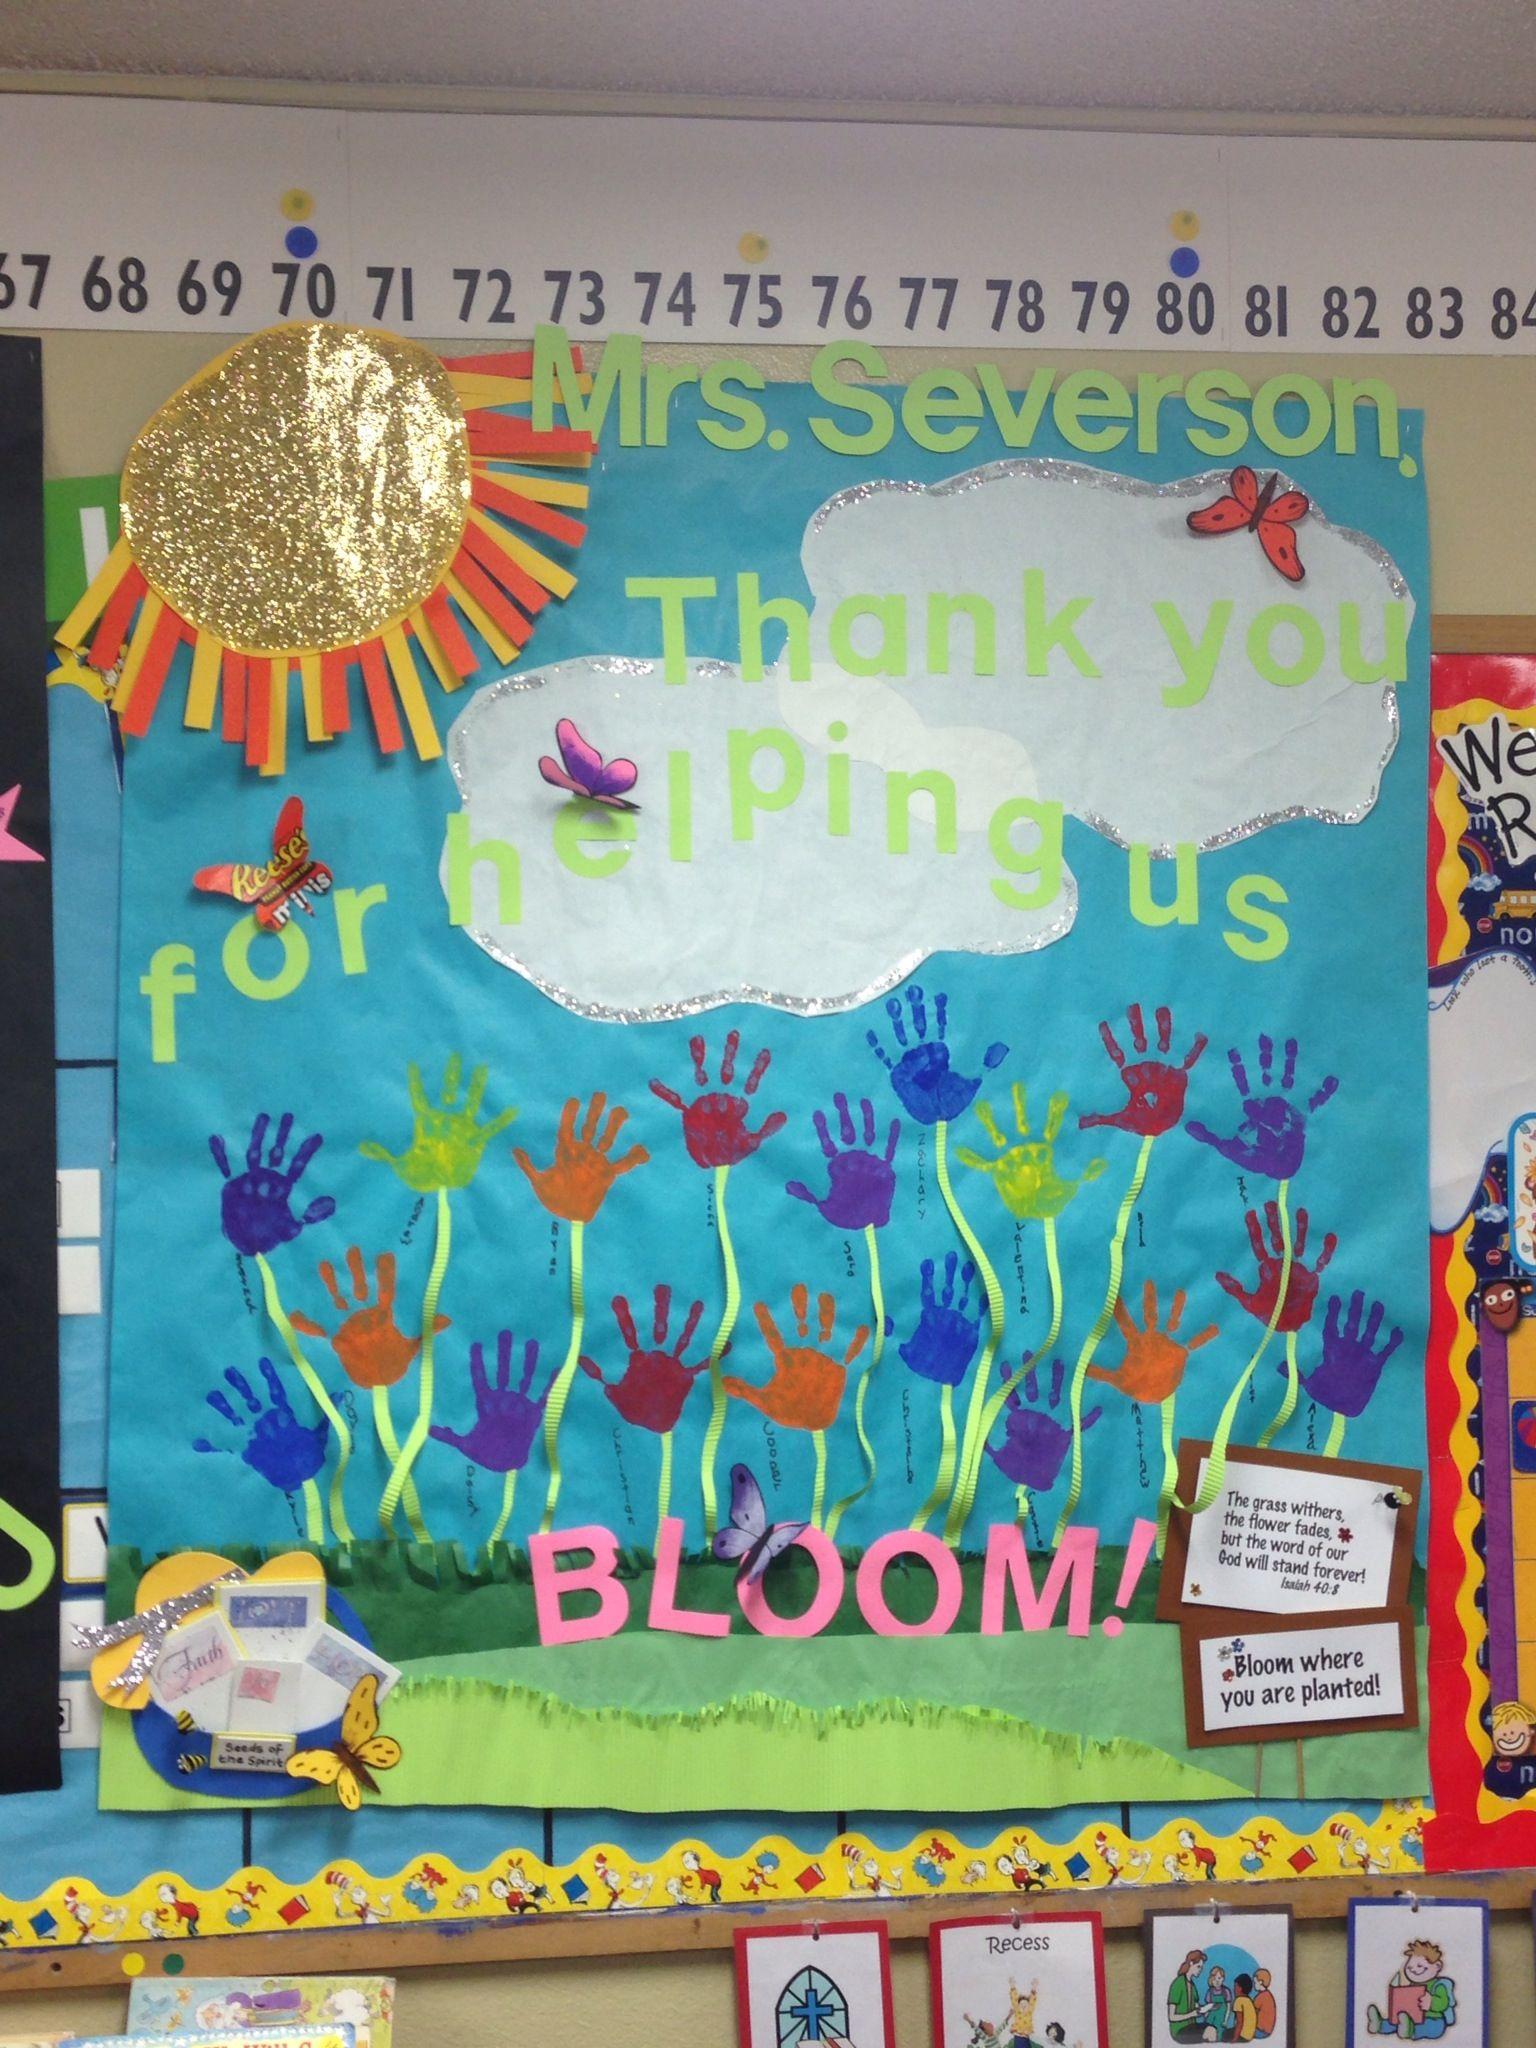 Pin By Irene Van Stockum Frakes On Teachers Teacher Appreciation Poster Appreciation Posters Teacher Appreciation